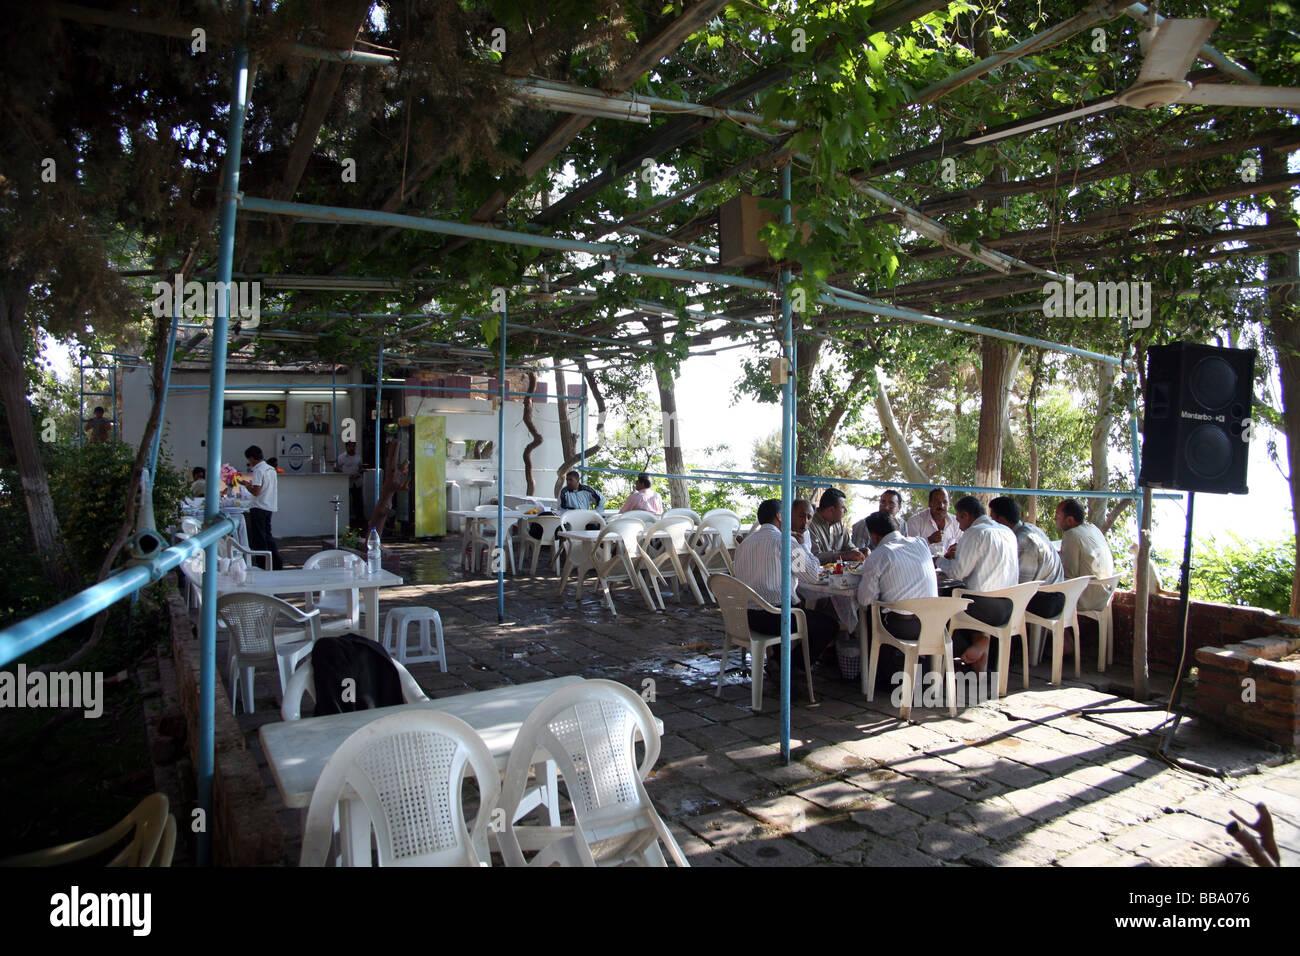 Restaurant near Qala' at ja' abar at lake Assad Syria - Stock Image